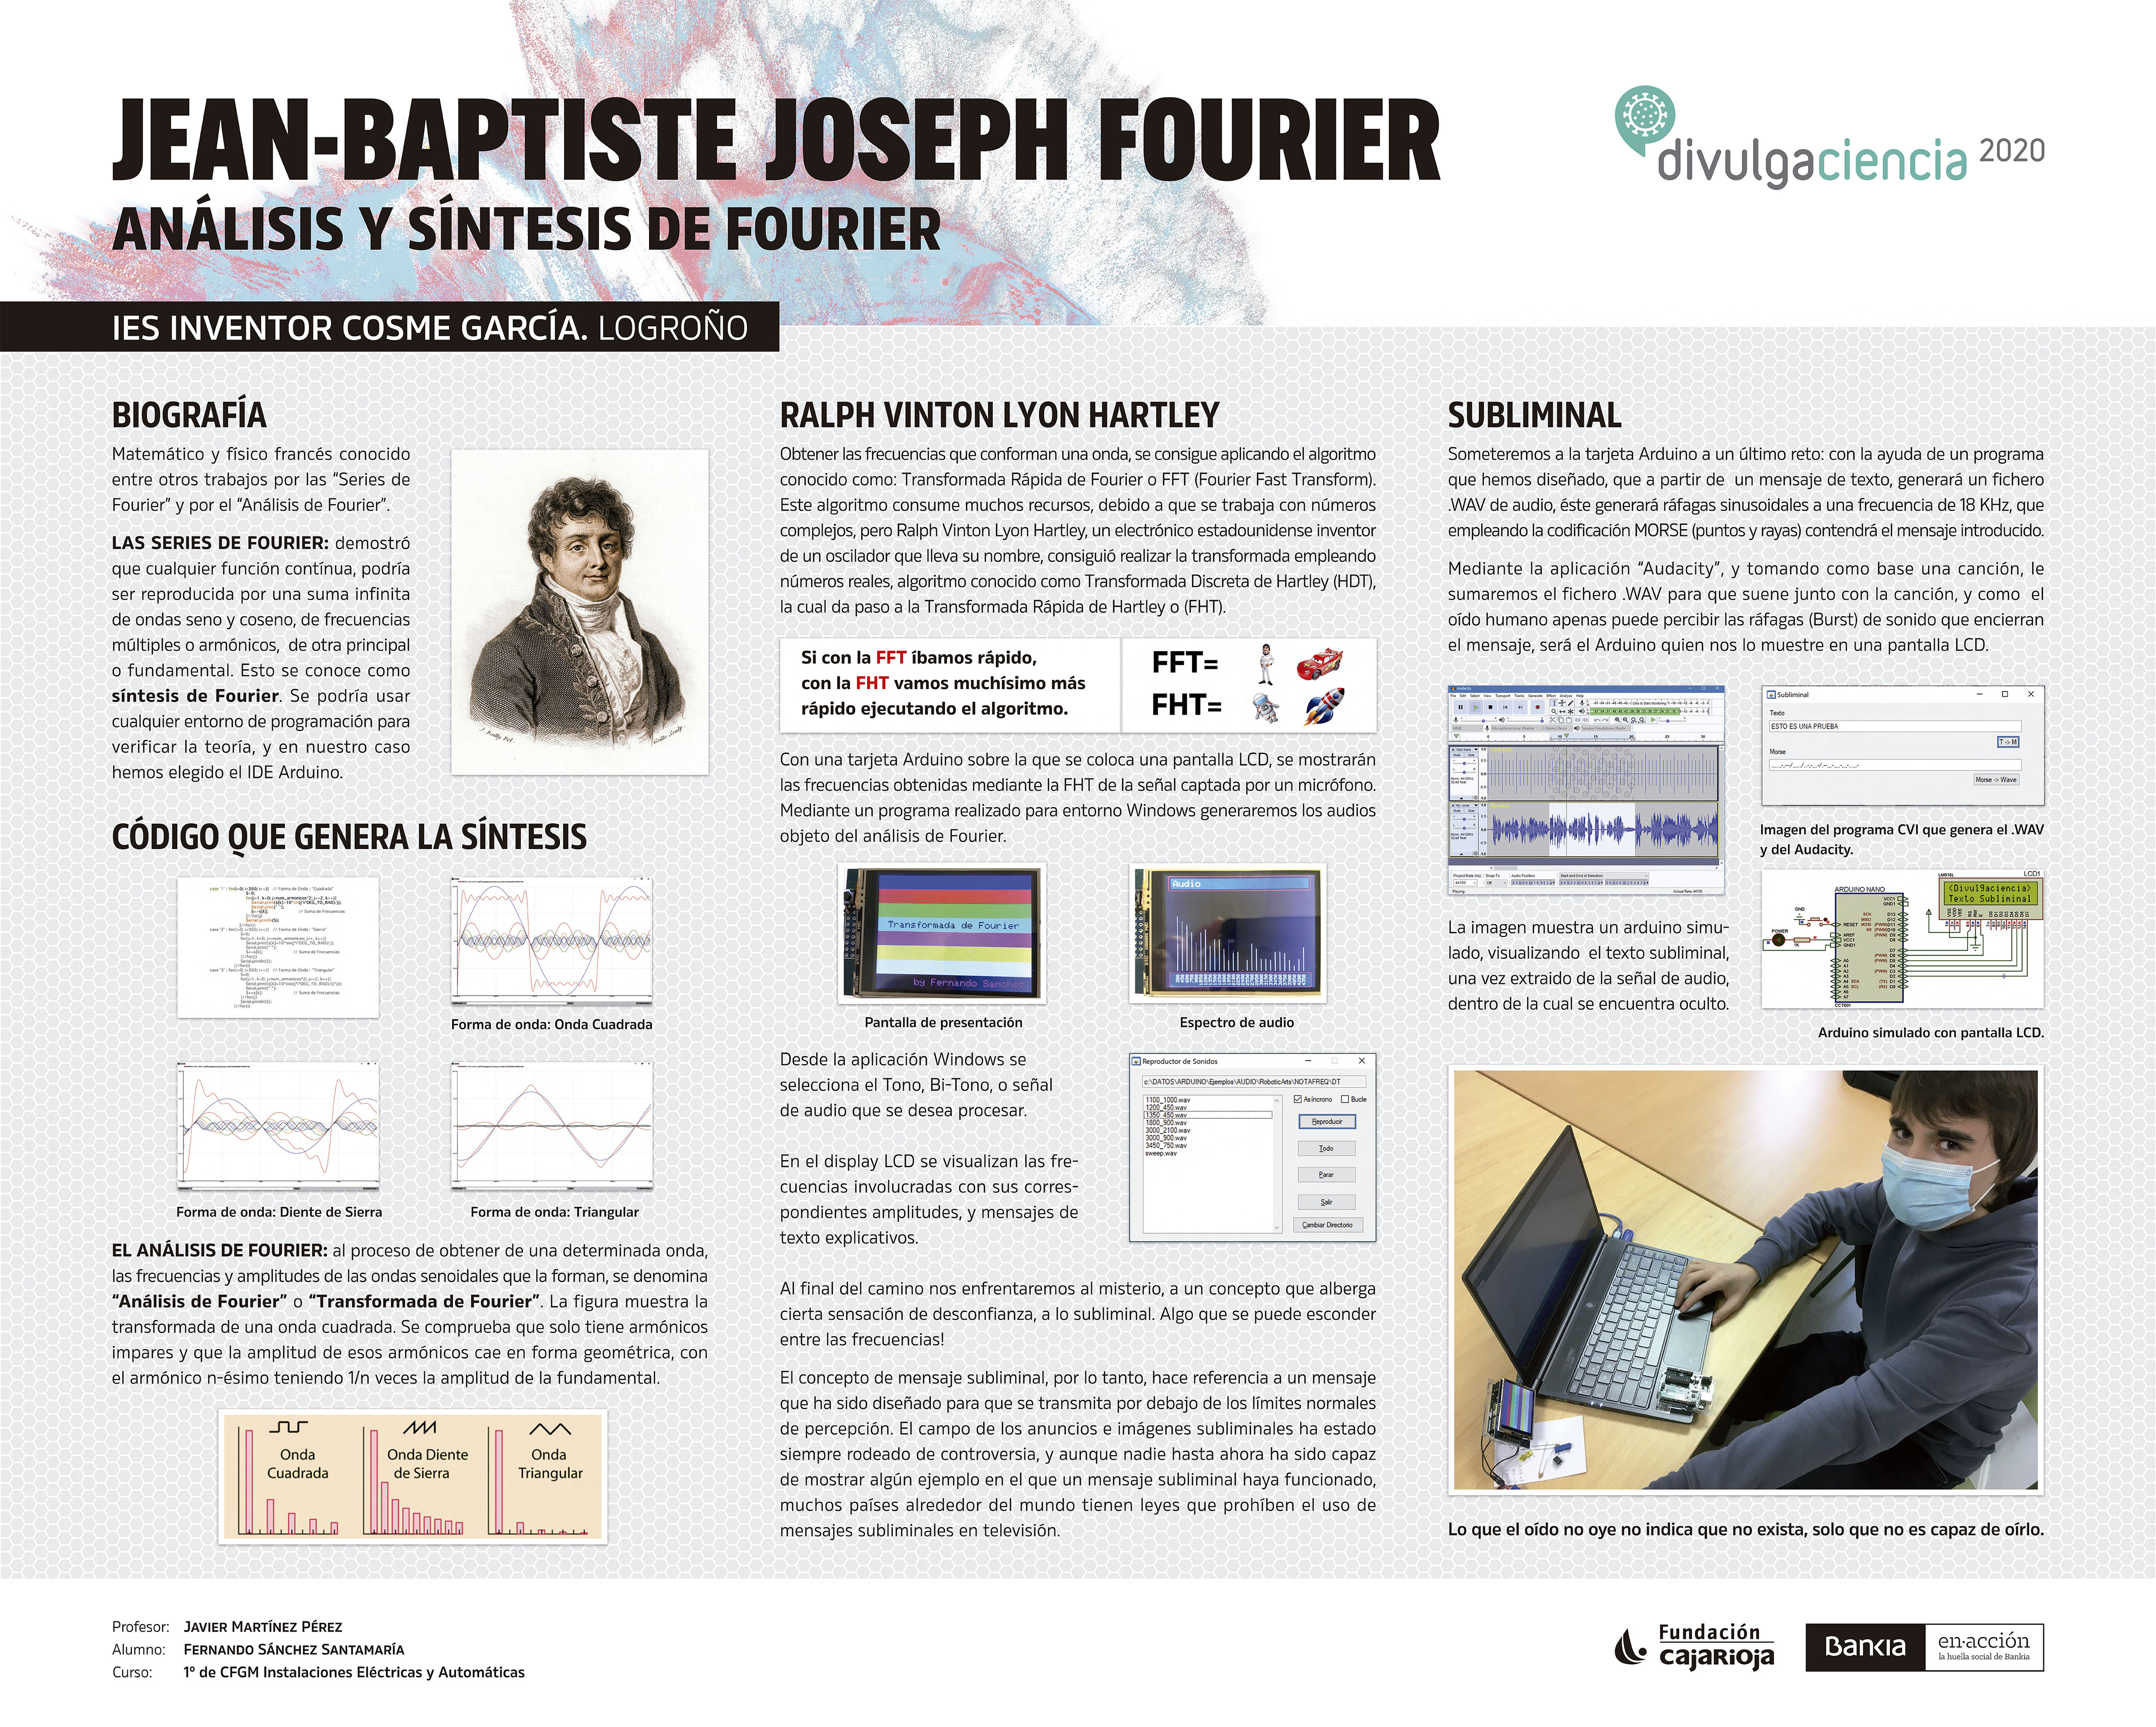 Panel JEAN-BAPTISTE JOSEPH FOURIER